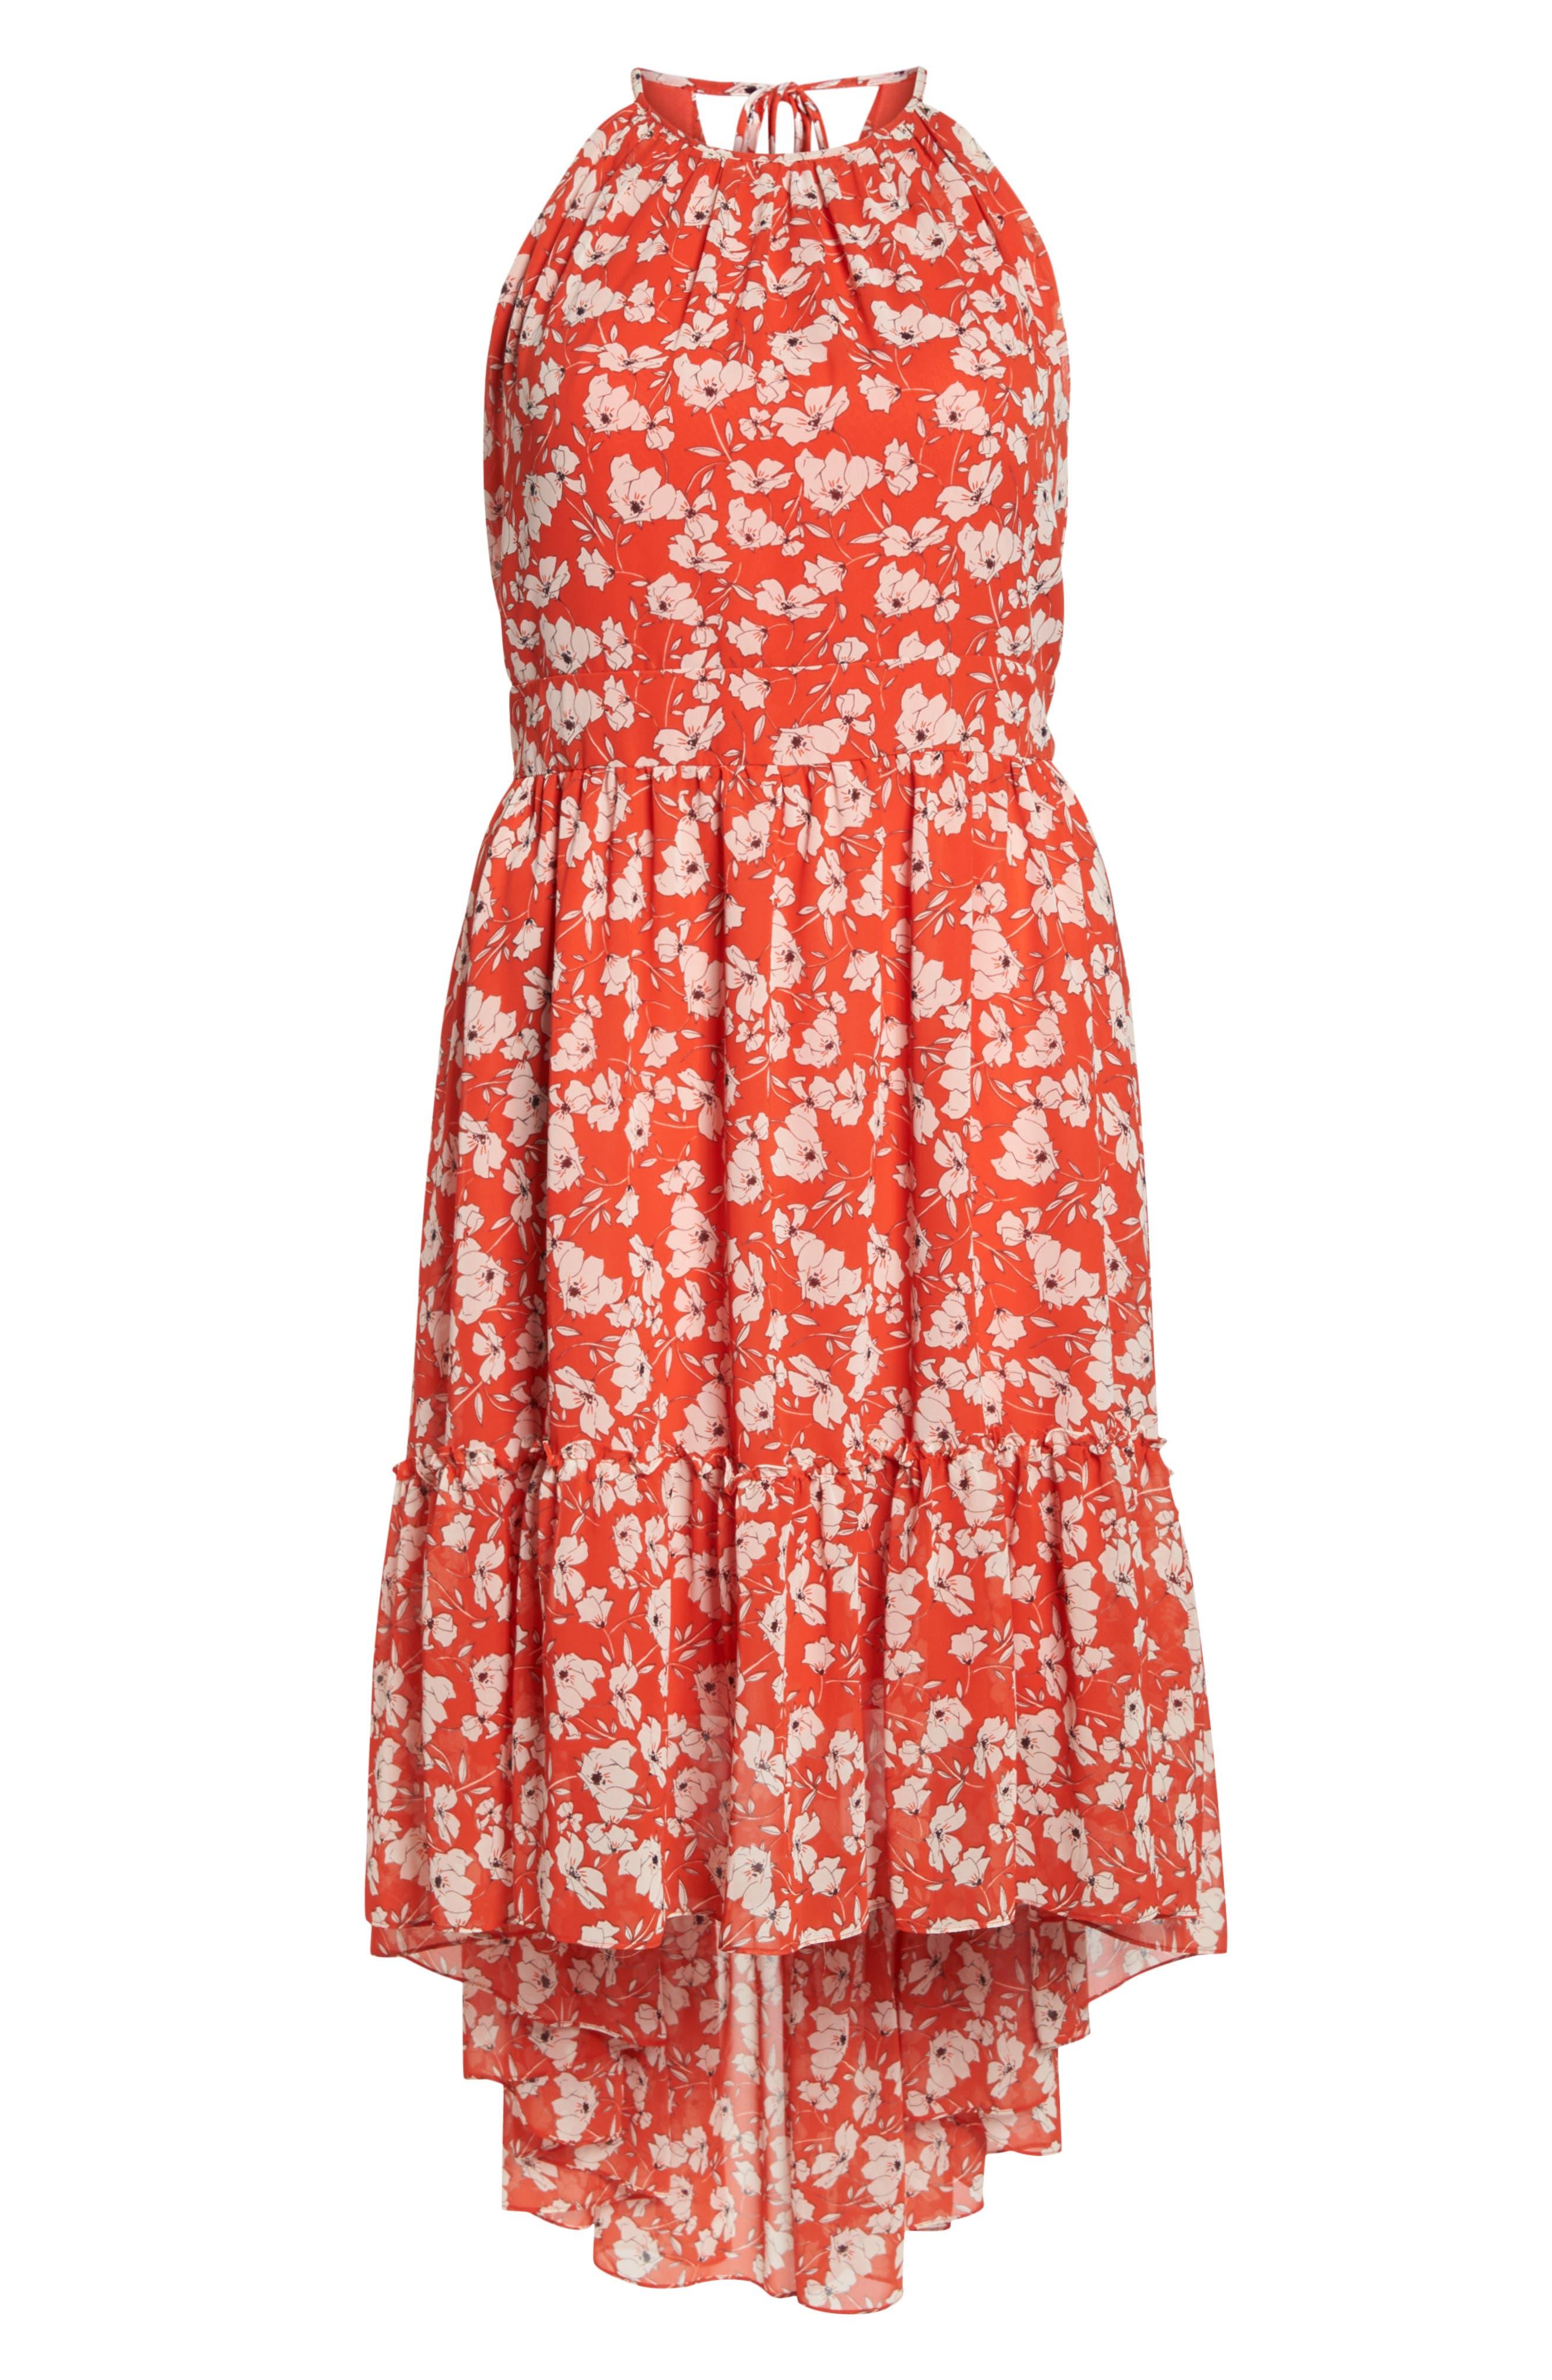 Ruffle Hem Halter Neck Chiffon Dress,                             Alternate thumbnail 7, color,                             600